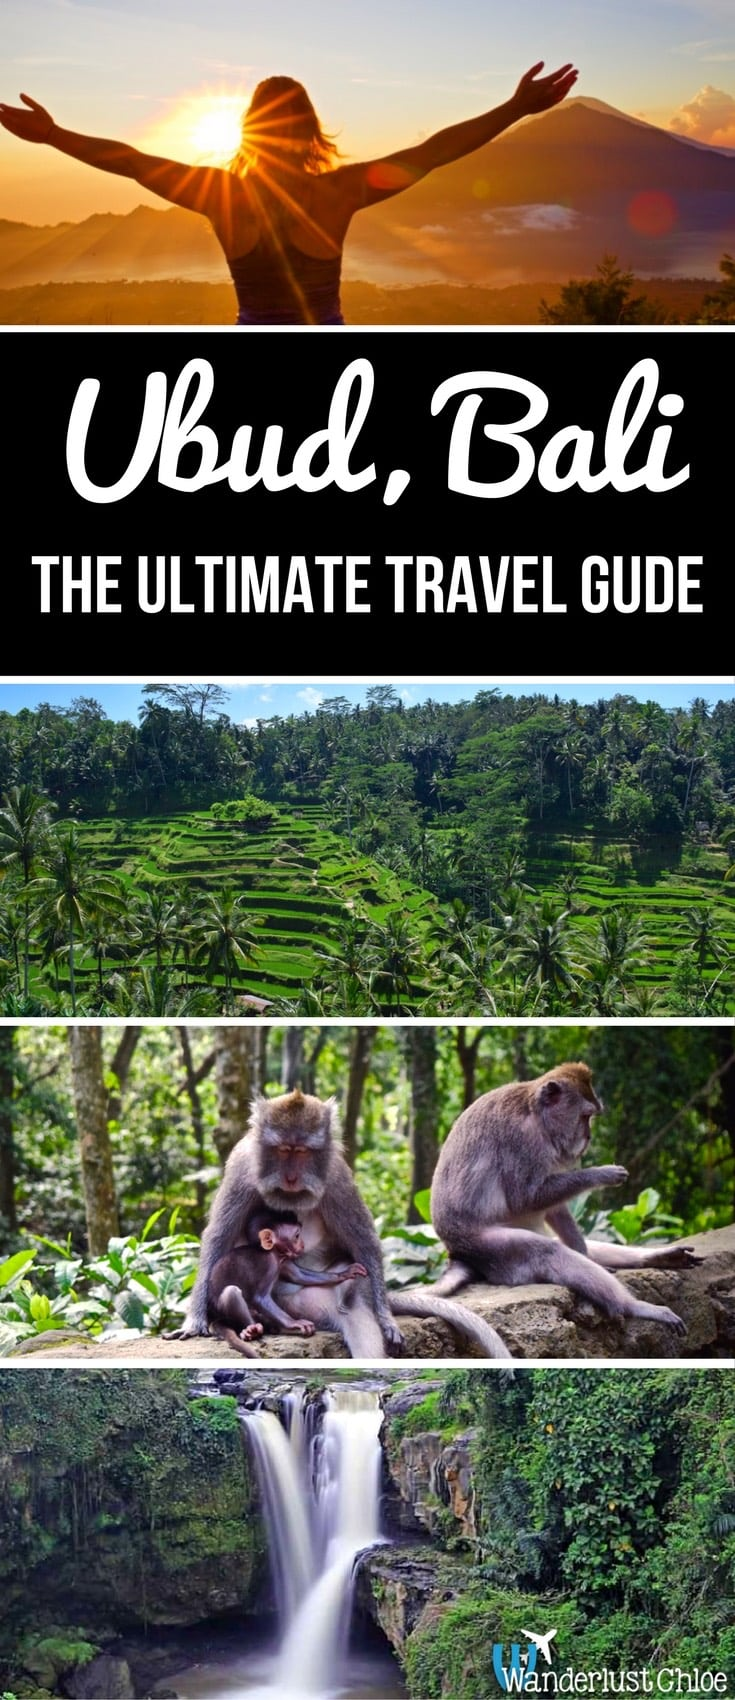 Ubud, Bali - The Ultimate Travel Guide